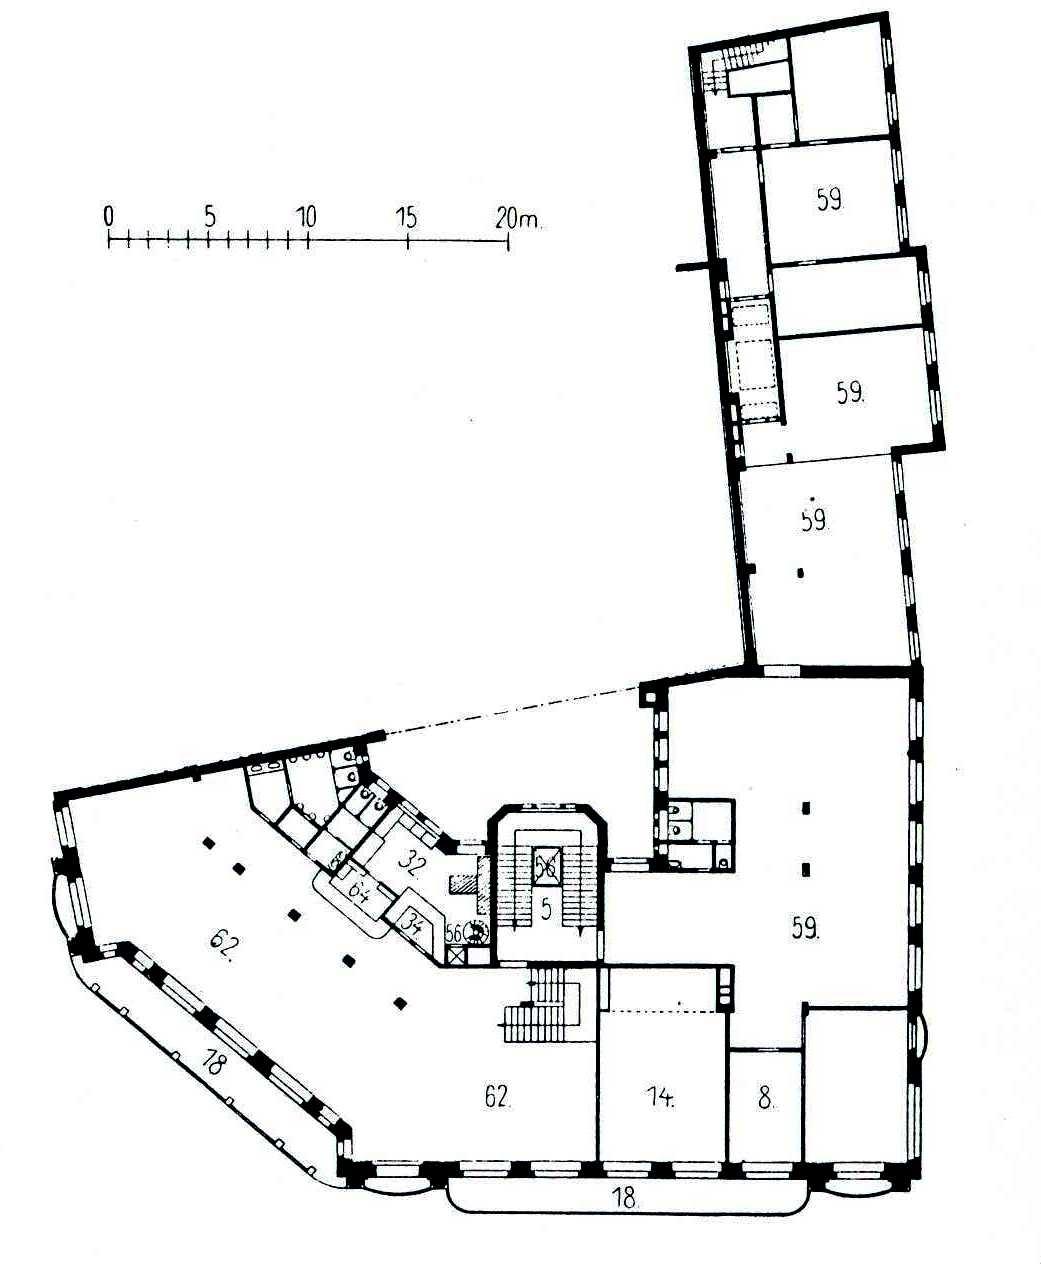 file haus wiener platz 1 ecke prager stra e dresden. Black Bedroom Furniture Sets. Home Design Ideas